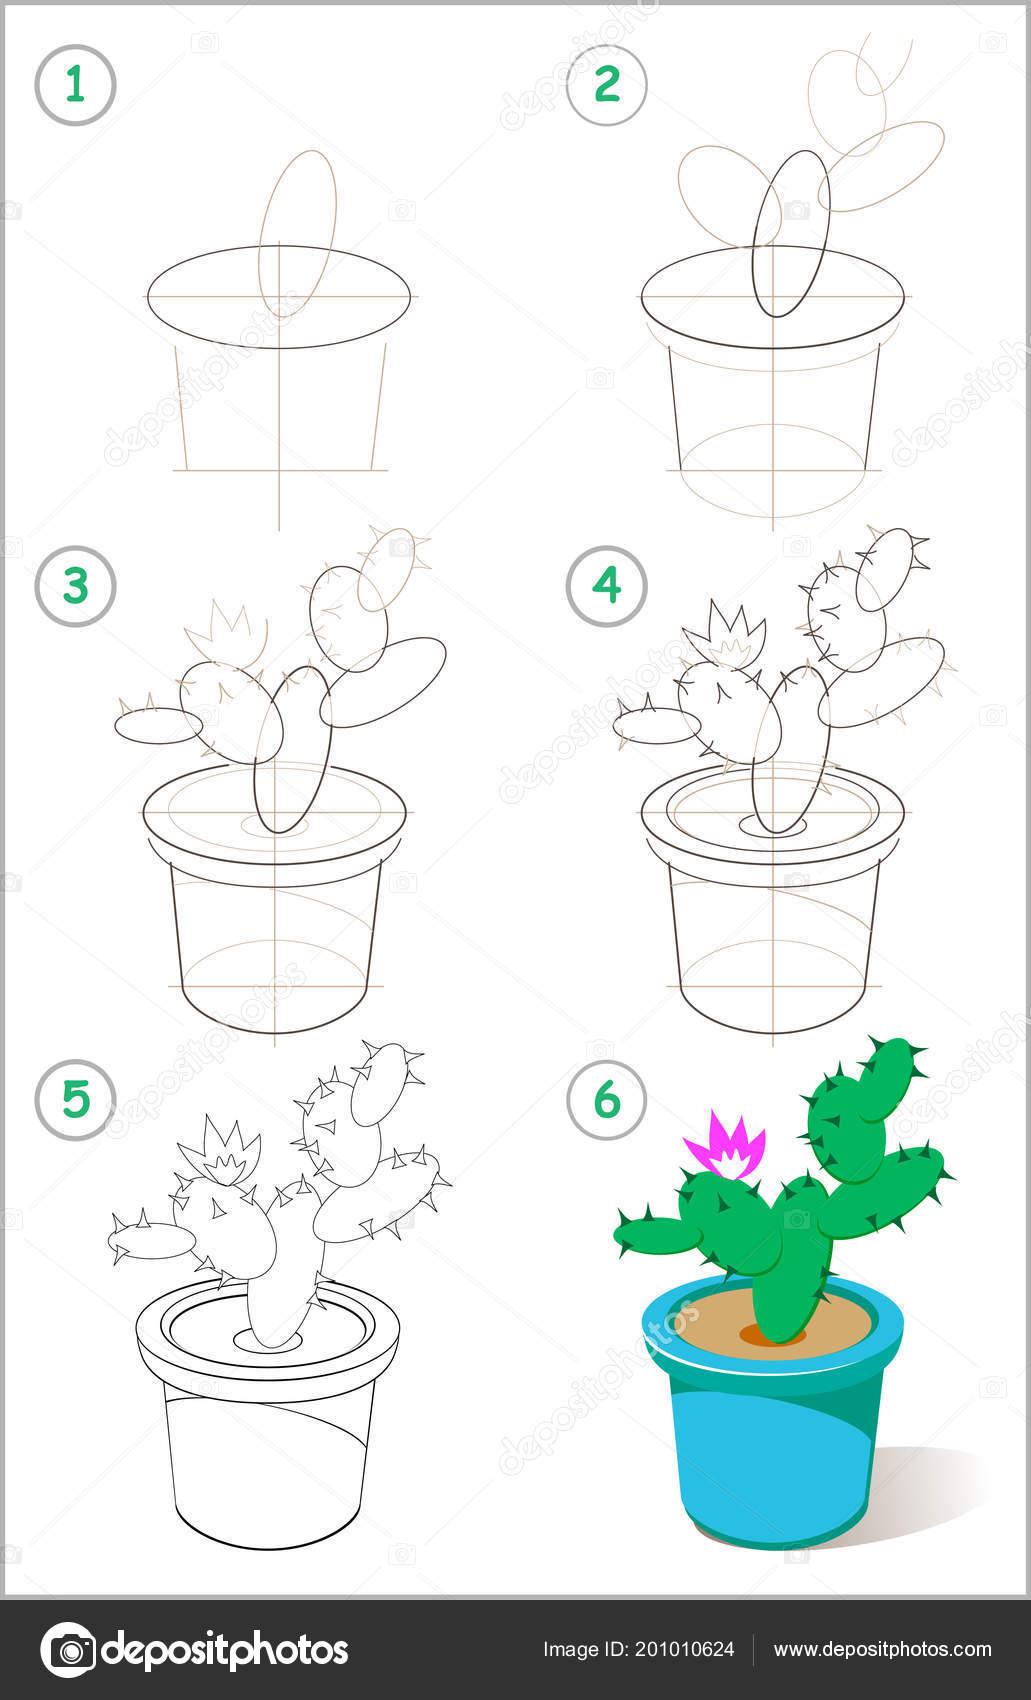 Pagina Mostra Come Imparare Passo Passo Disegnare Fioritura Cactus